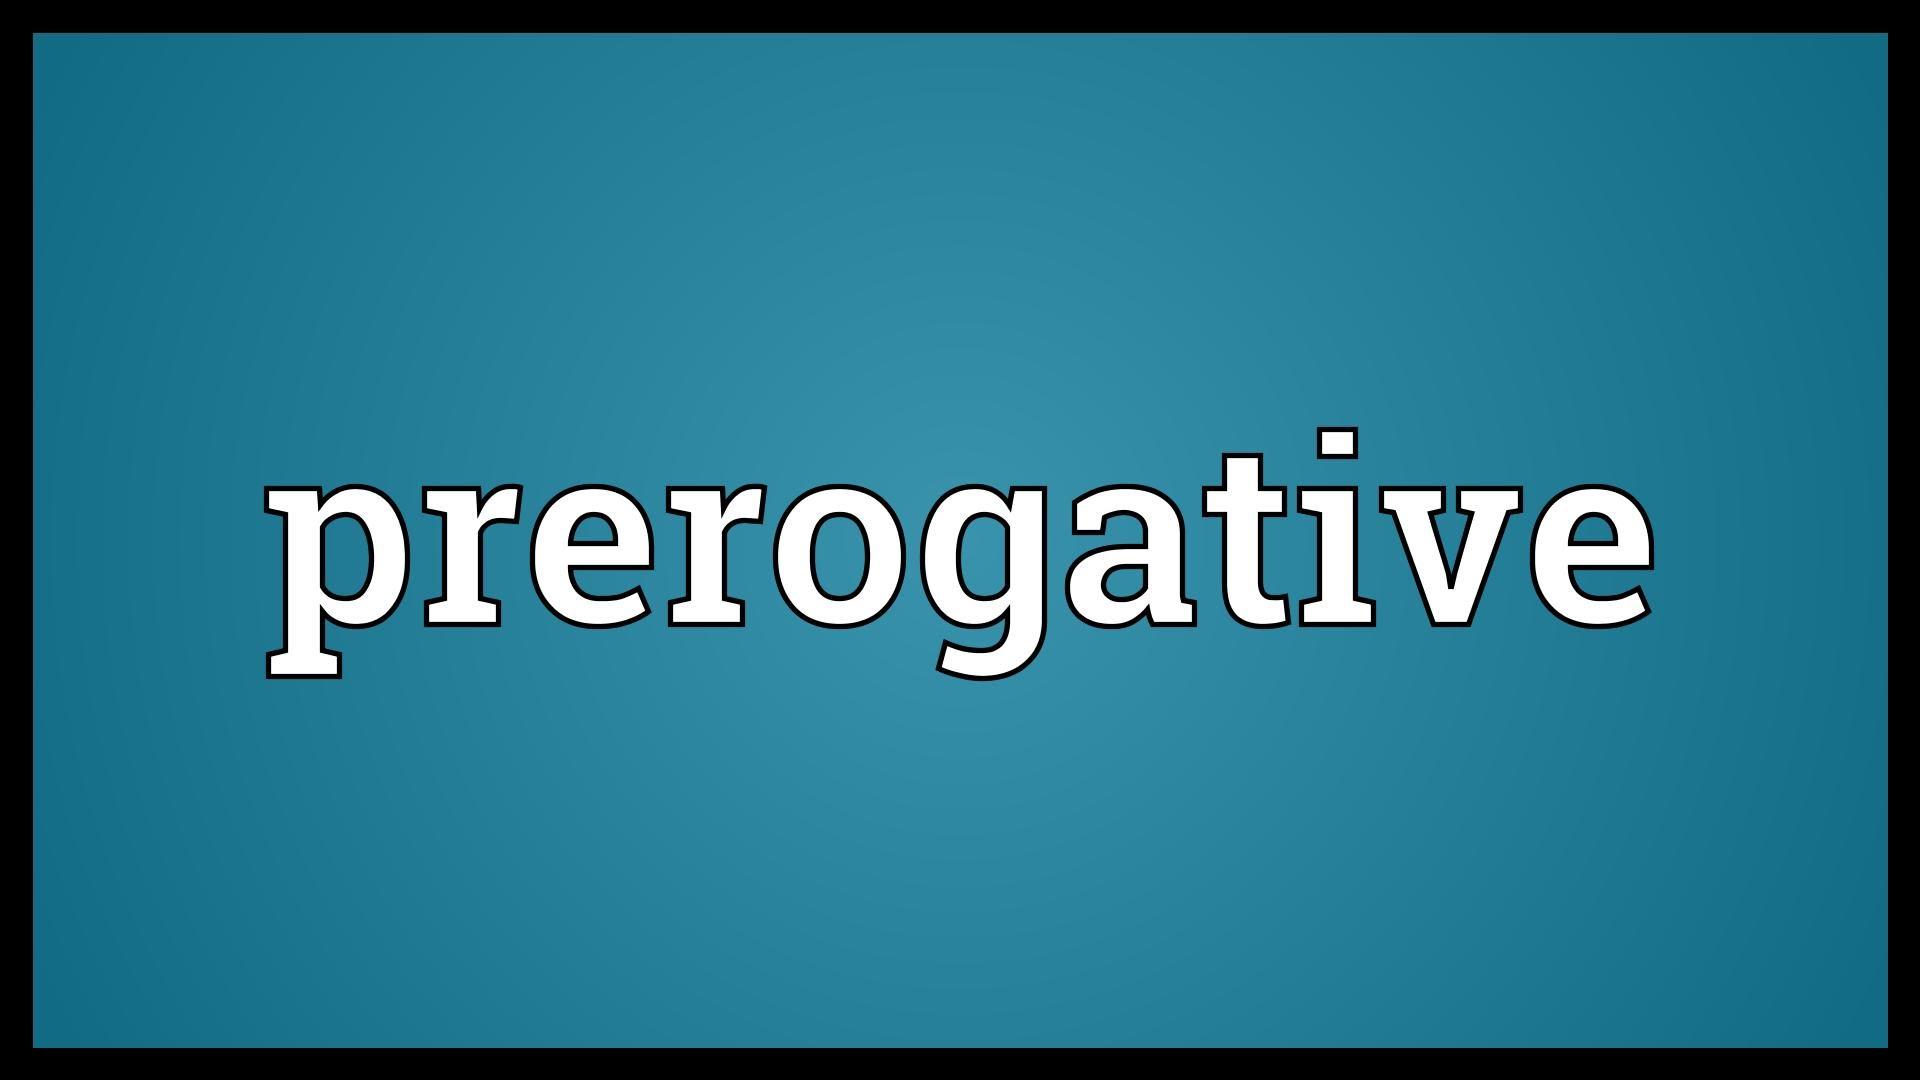 My Prerogative - Wikipedia